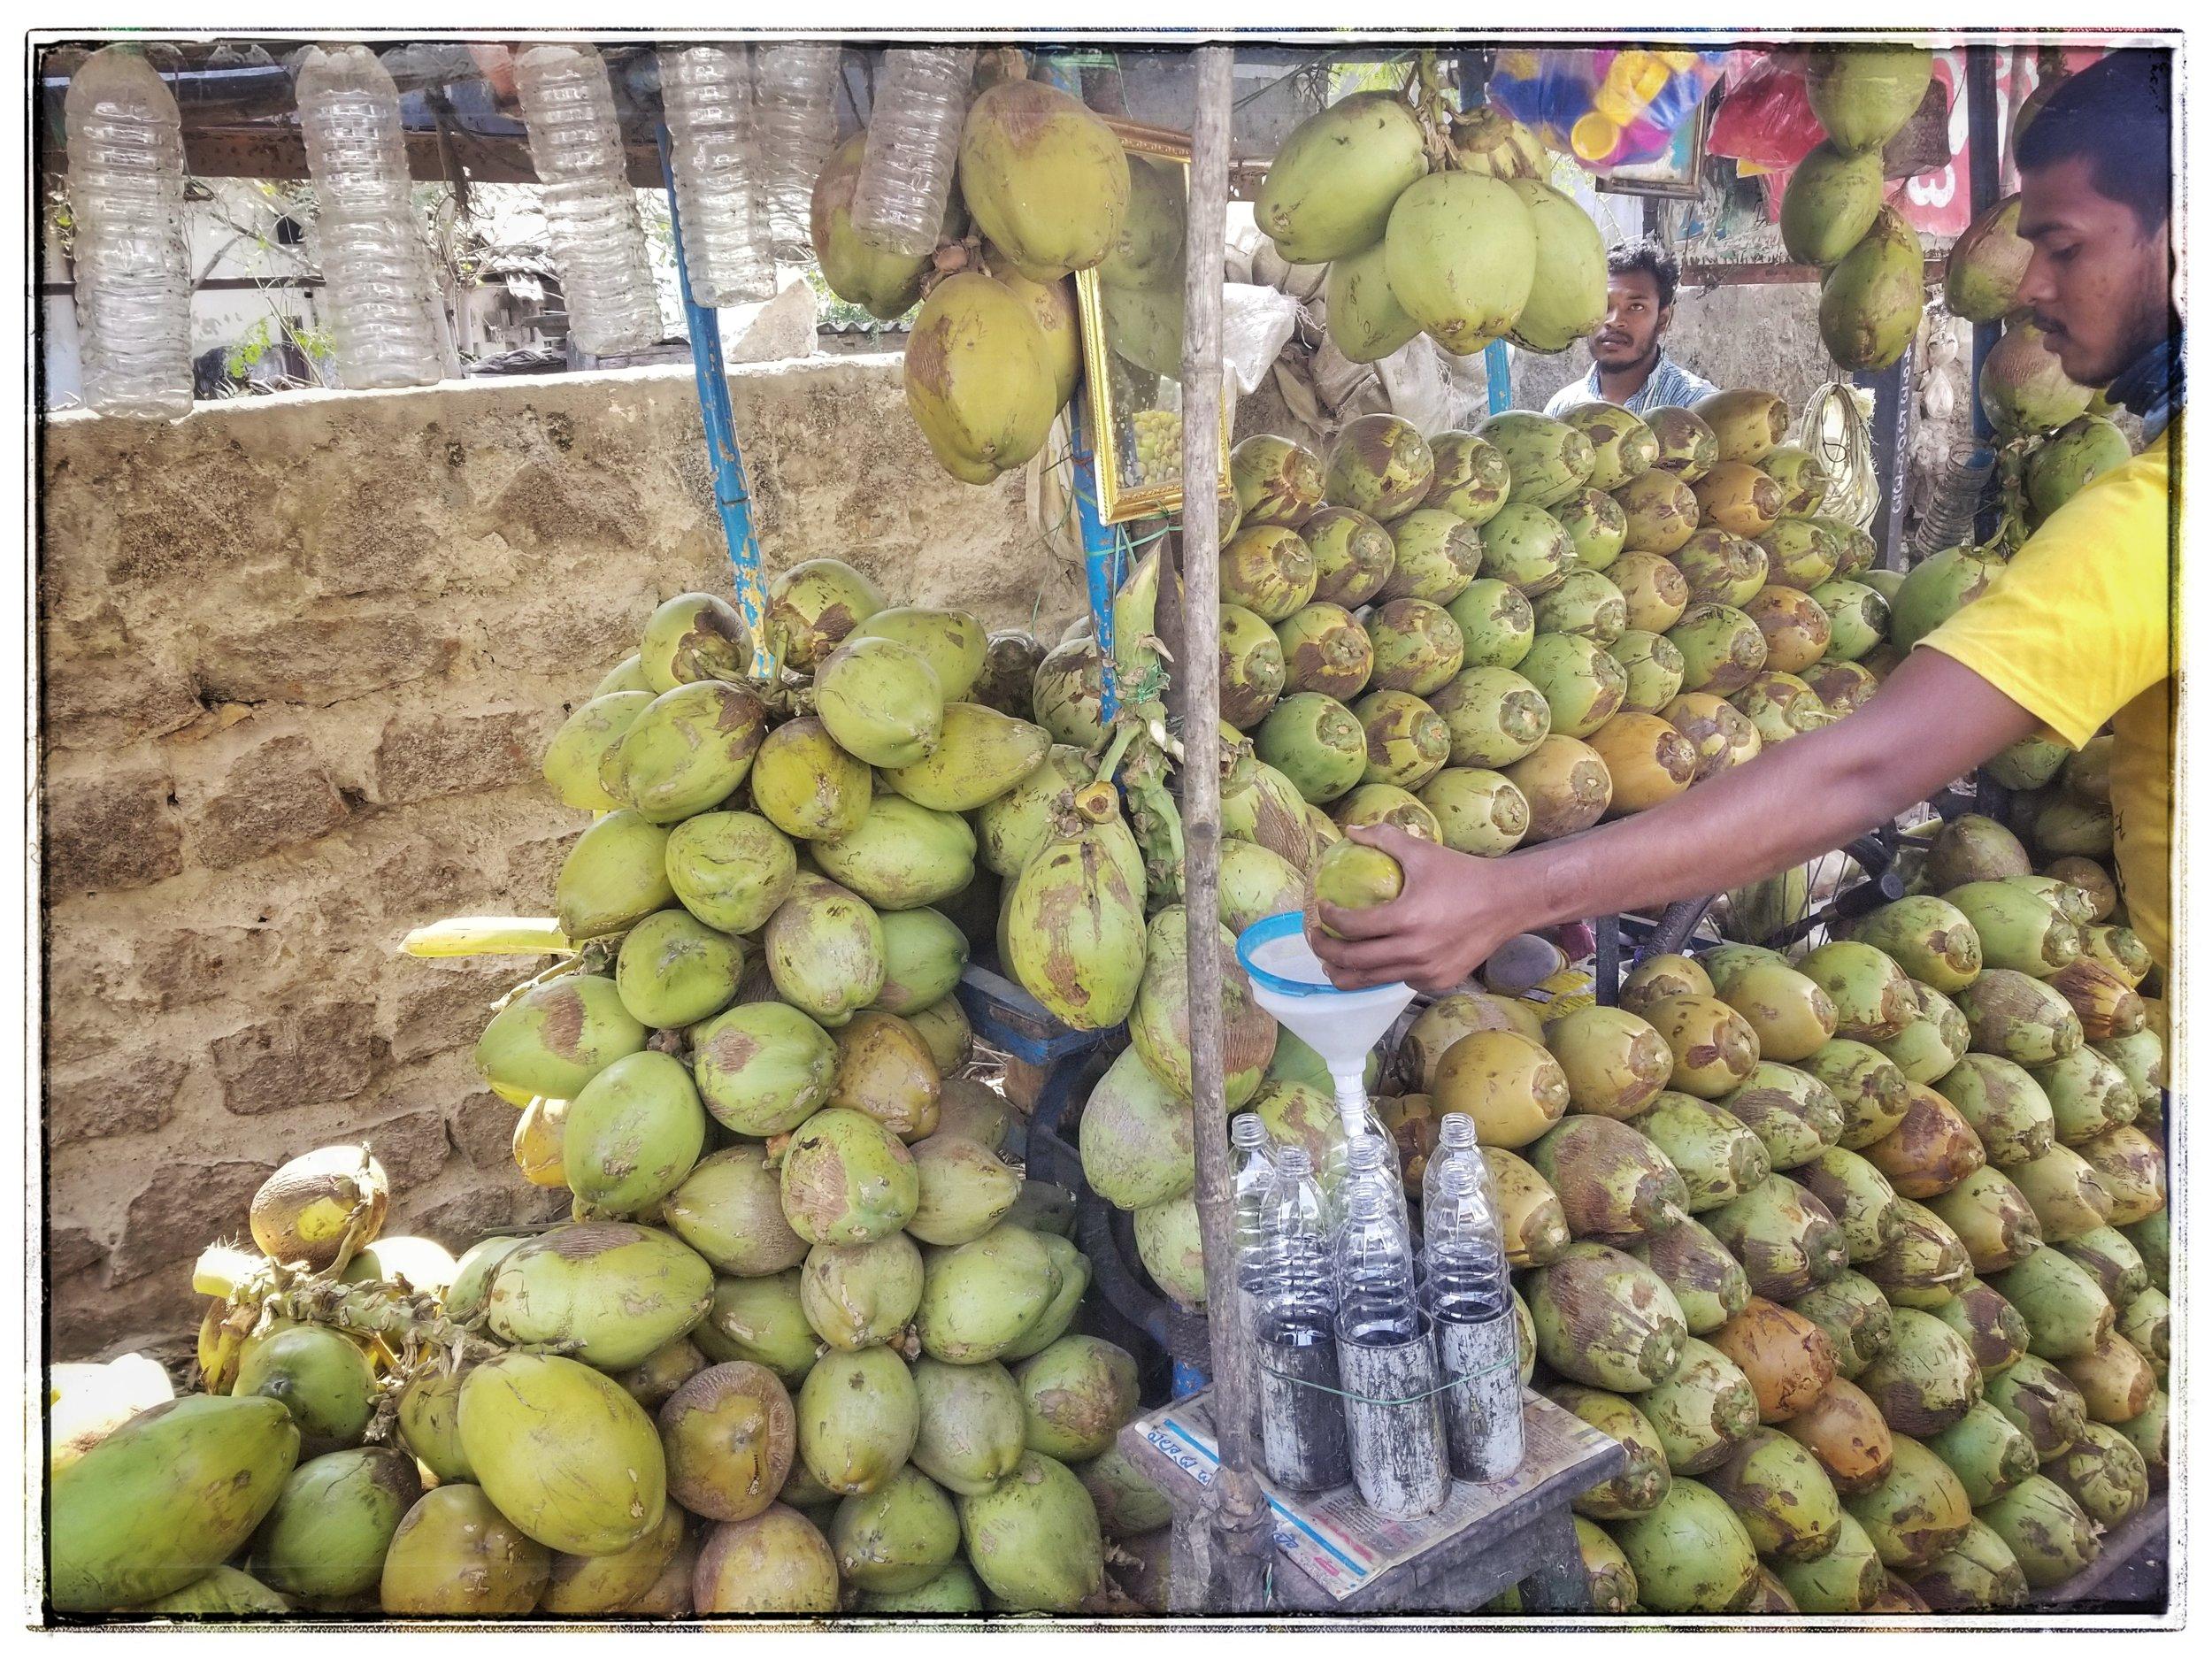 Street vendor making coconut water.